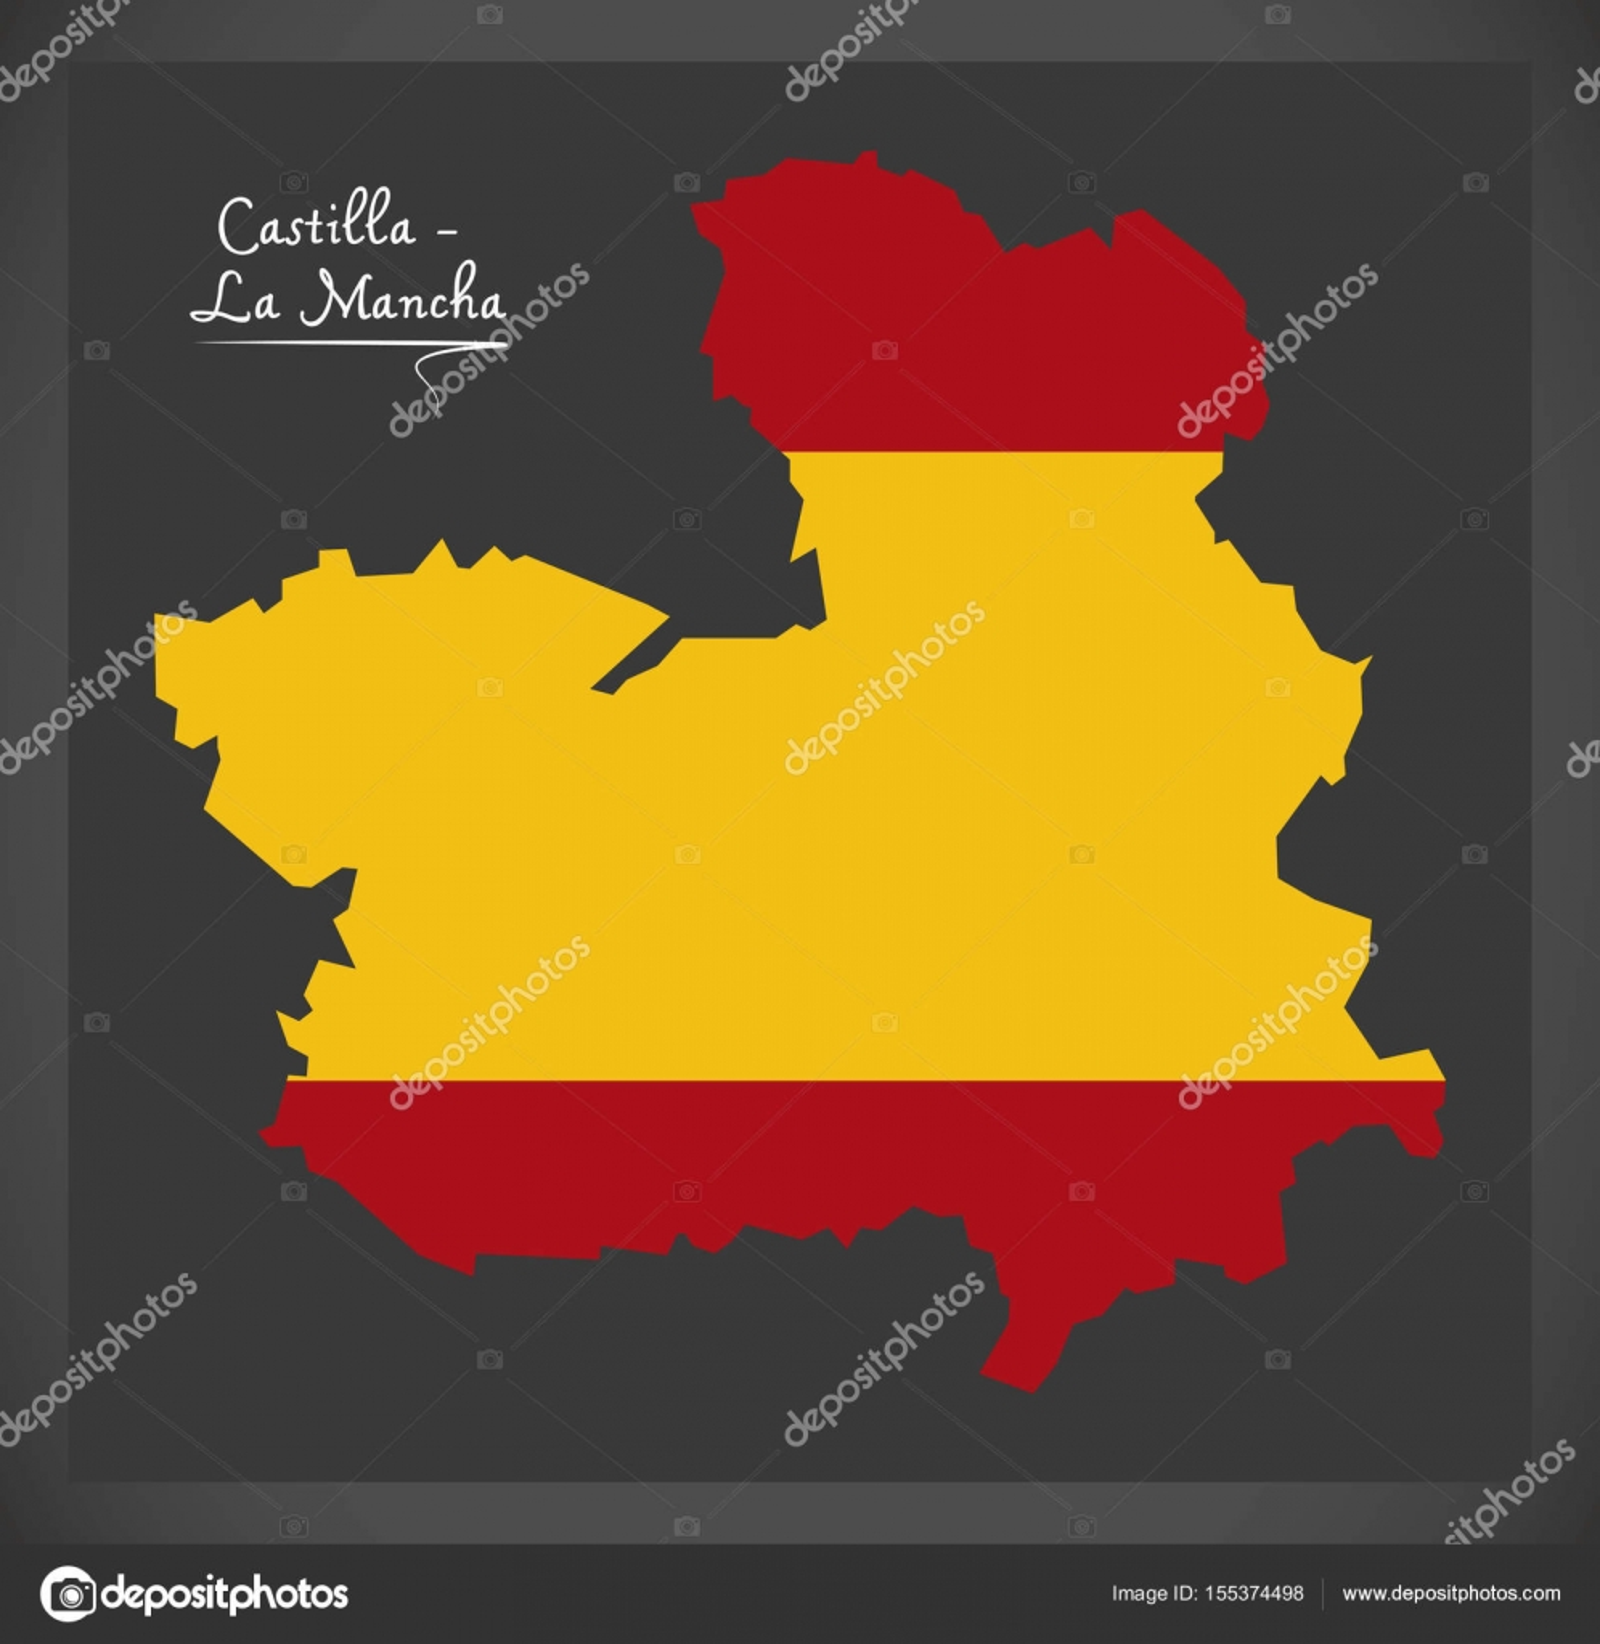 La Mancha Spain Map.Castilla La Mancha Map With Spanish National Flag Illustration